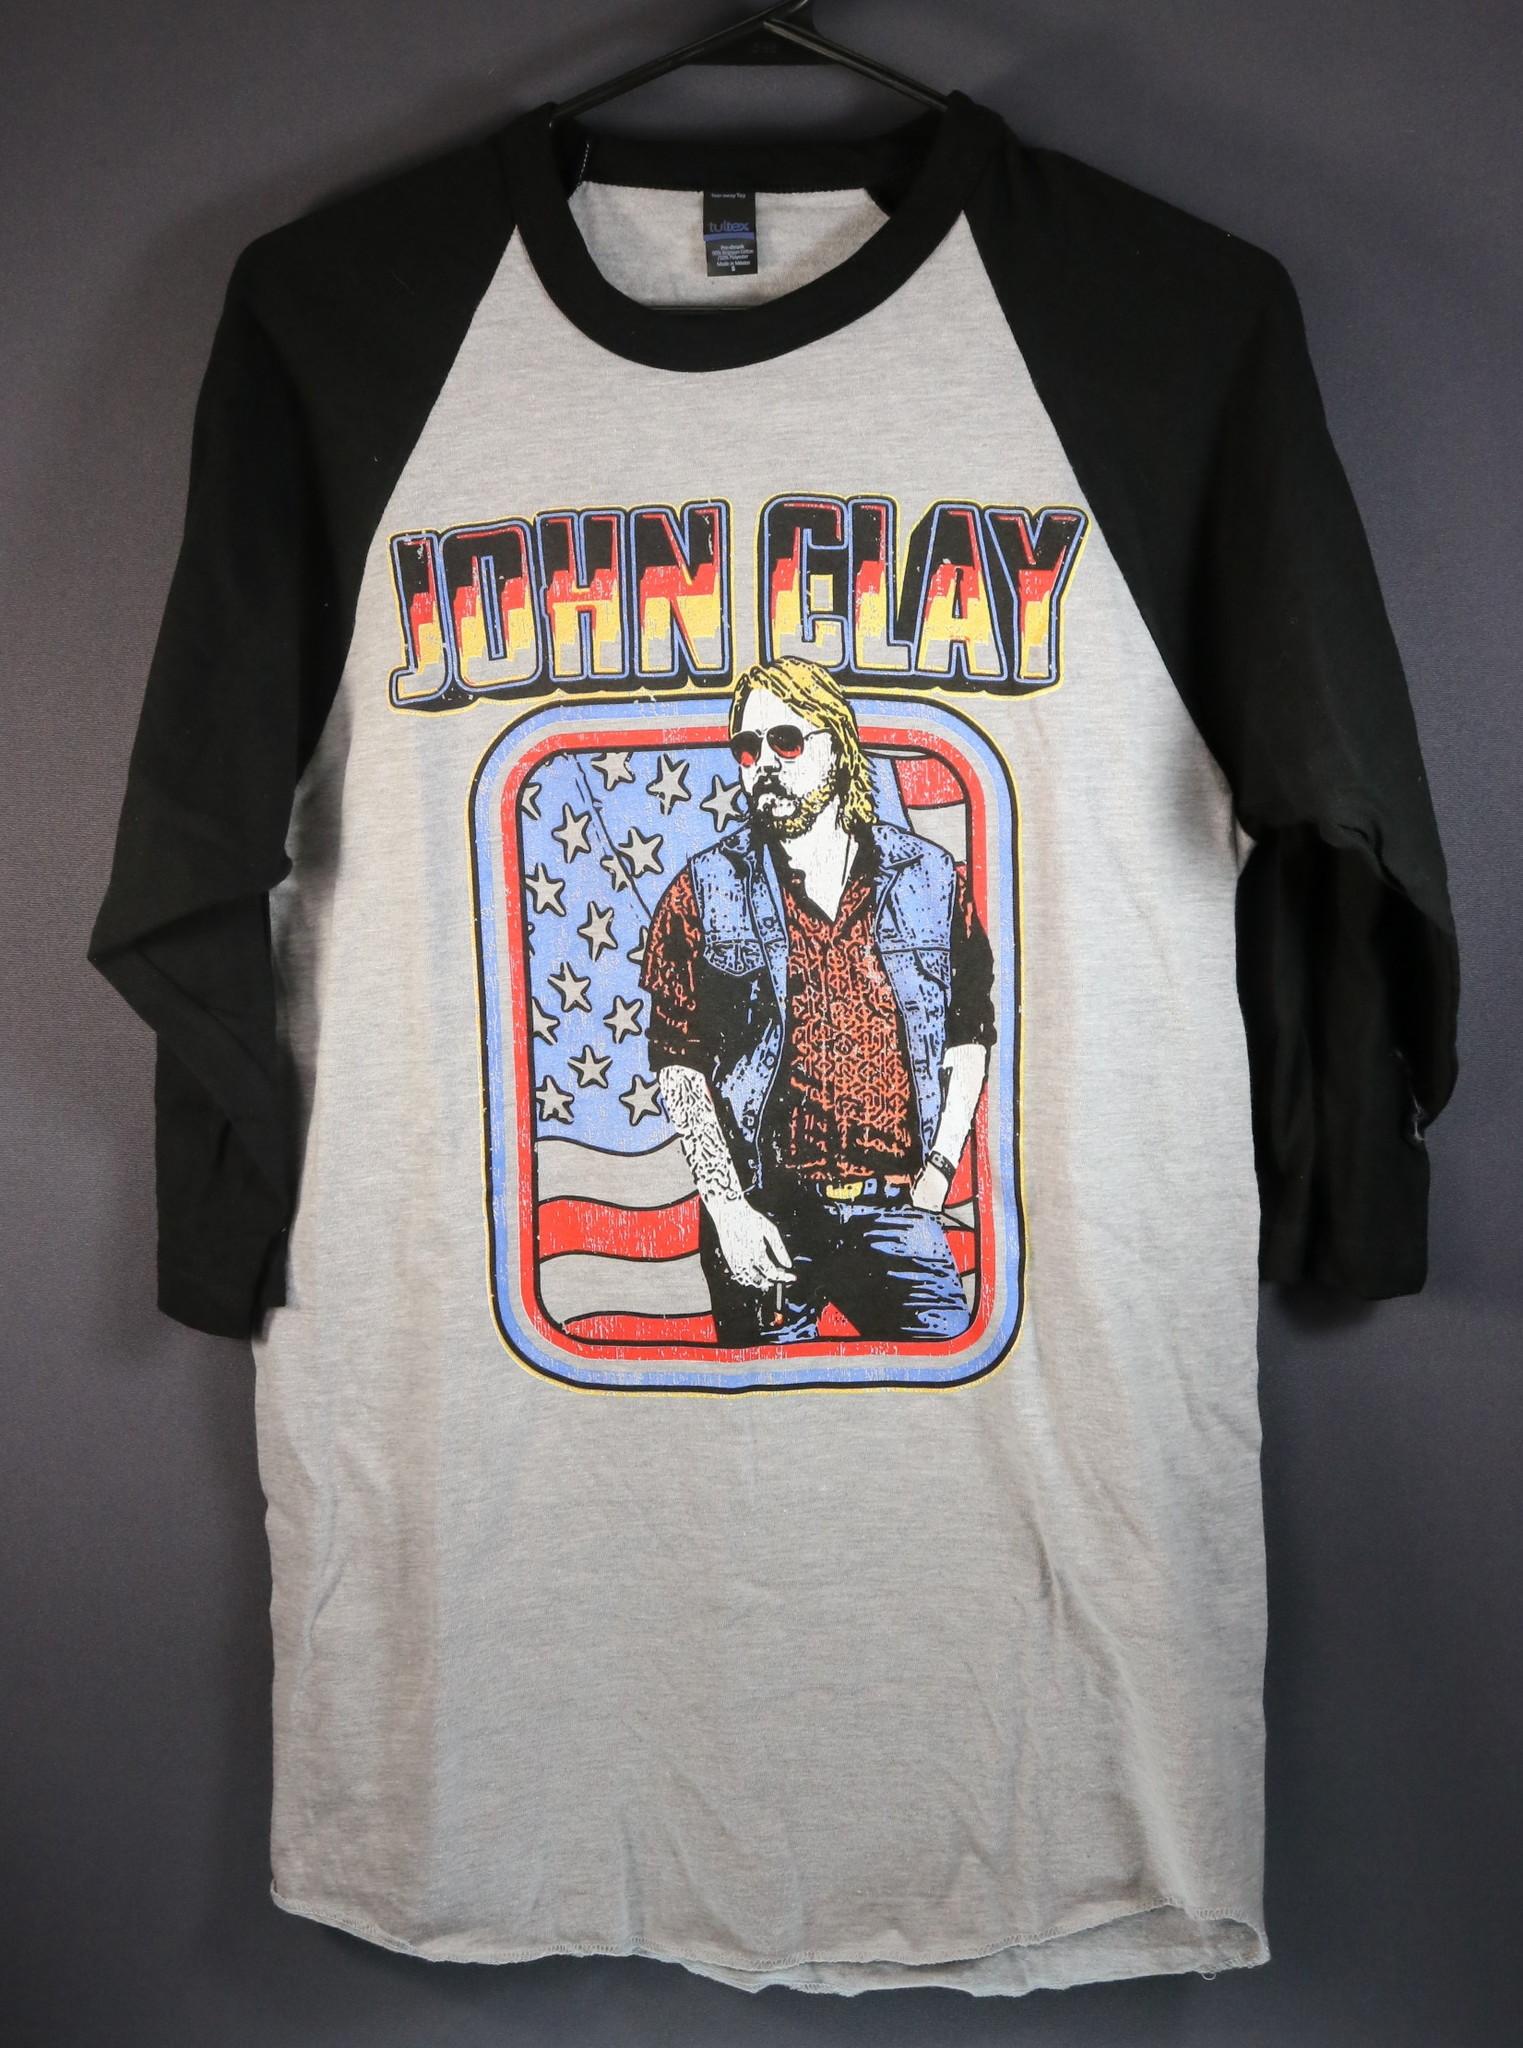 Local Music NEW John Clay 3/4 Sleeve Baseball T-Shirt - M